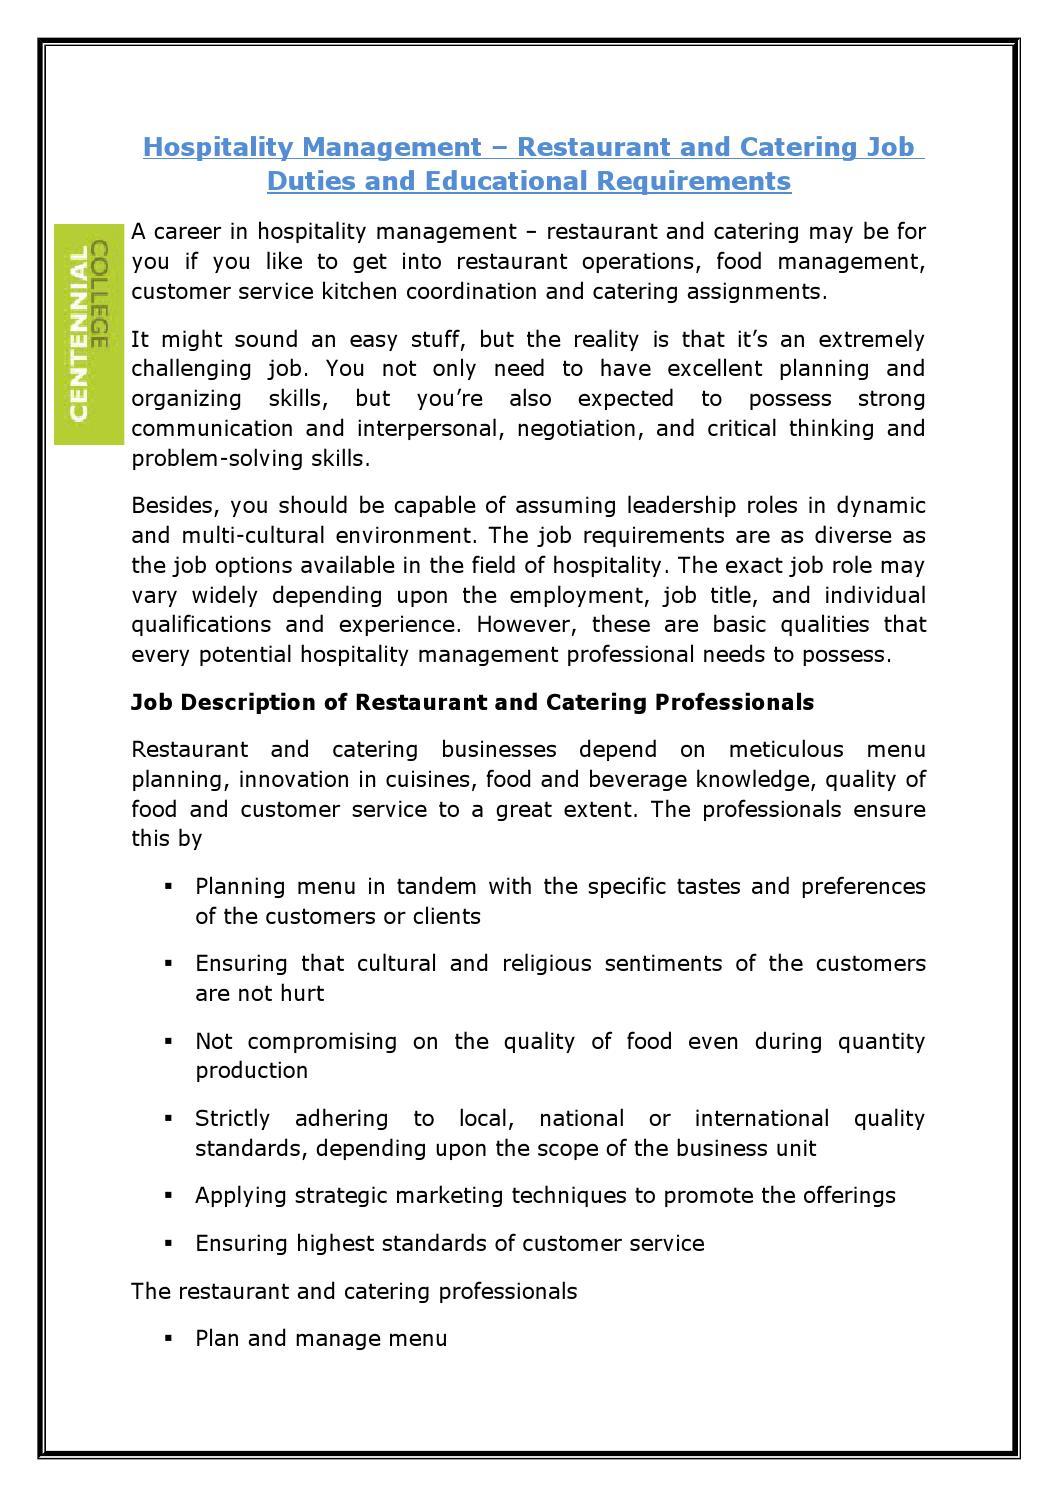 customer service job requirements